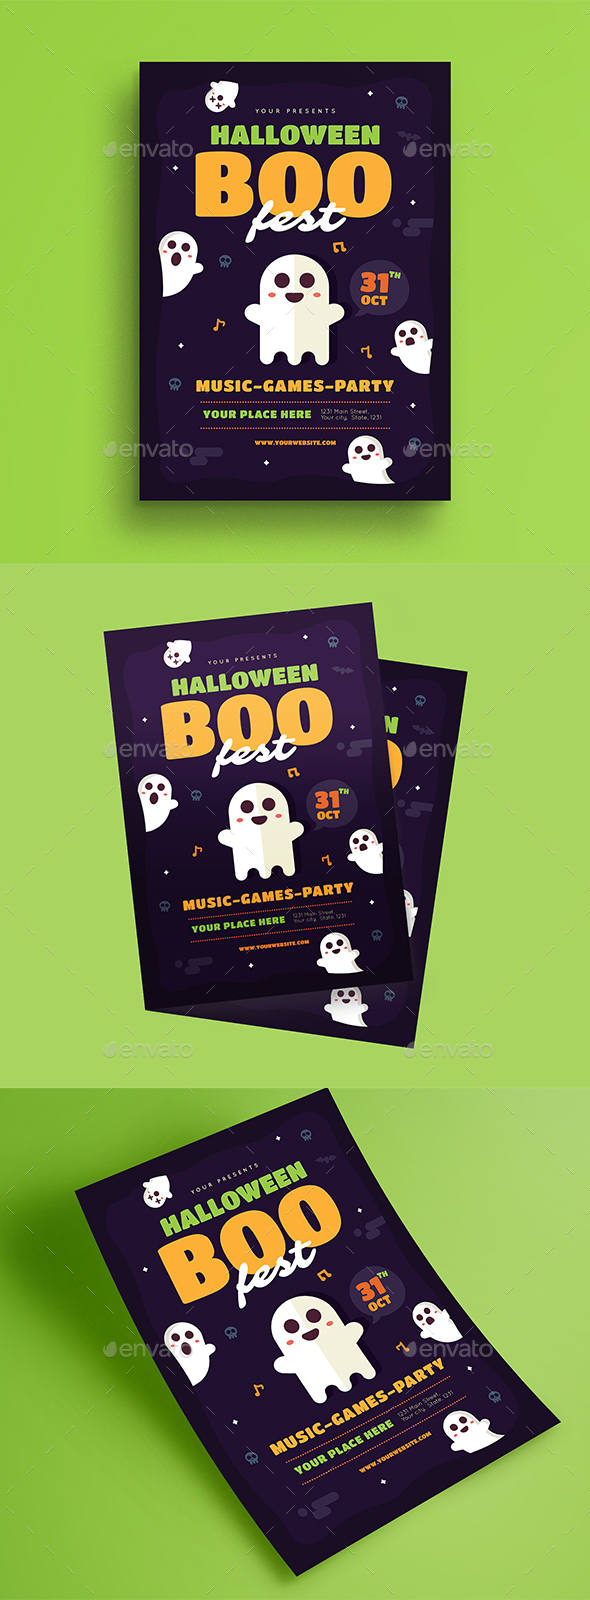 Halloween Boo Fest Flyer - Events Flyers